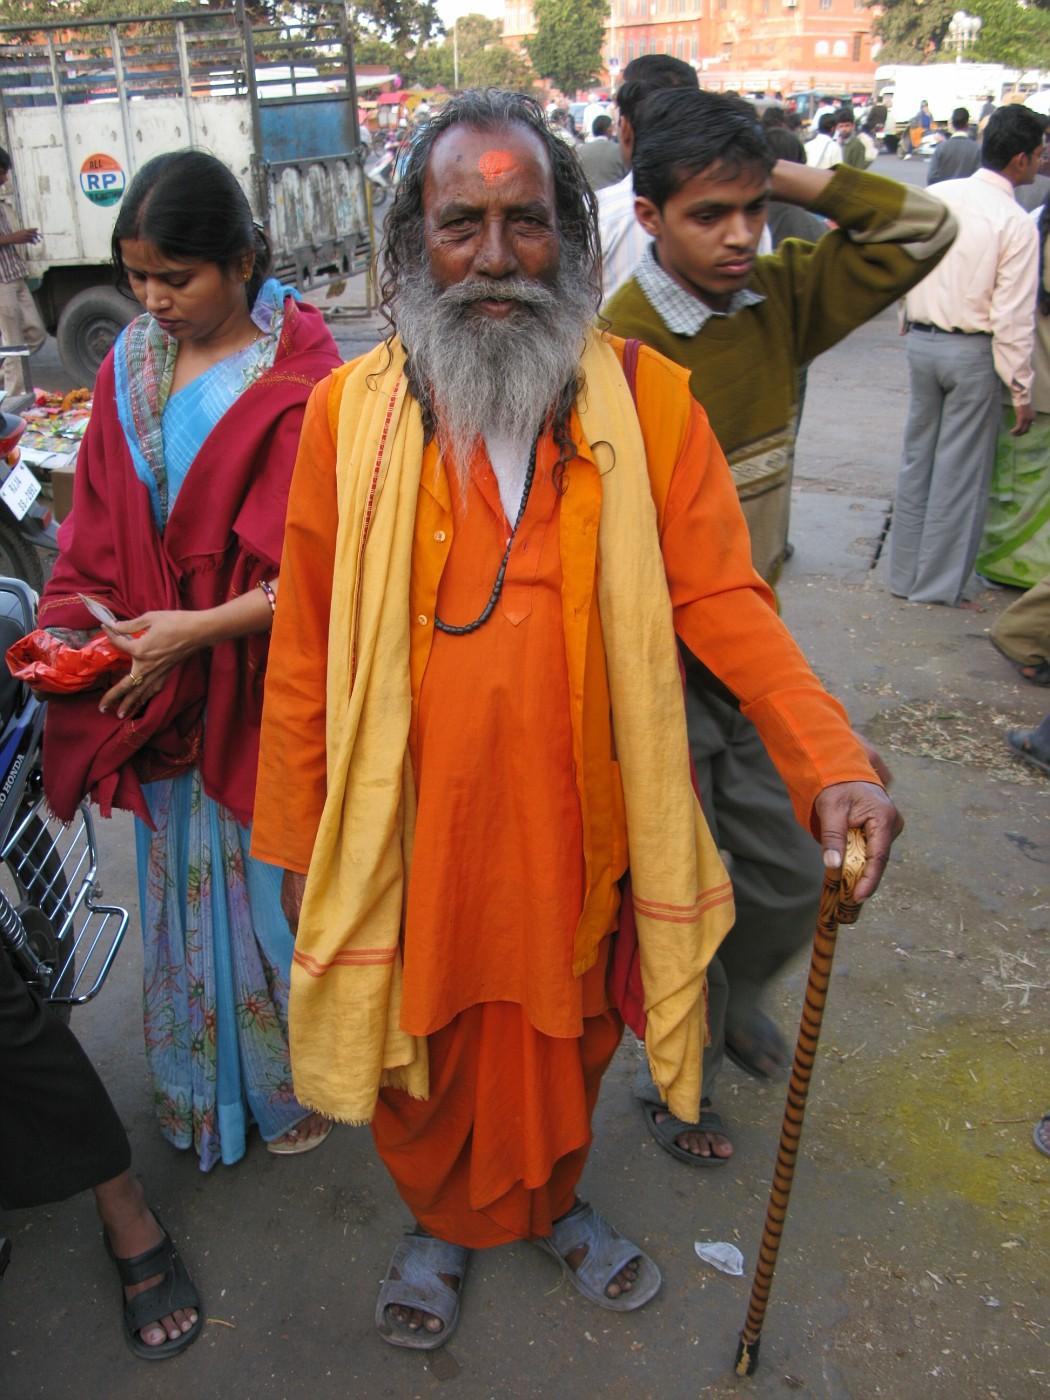 Jaipur, India Market and Street Life (41)